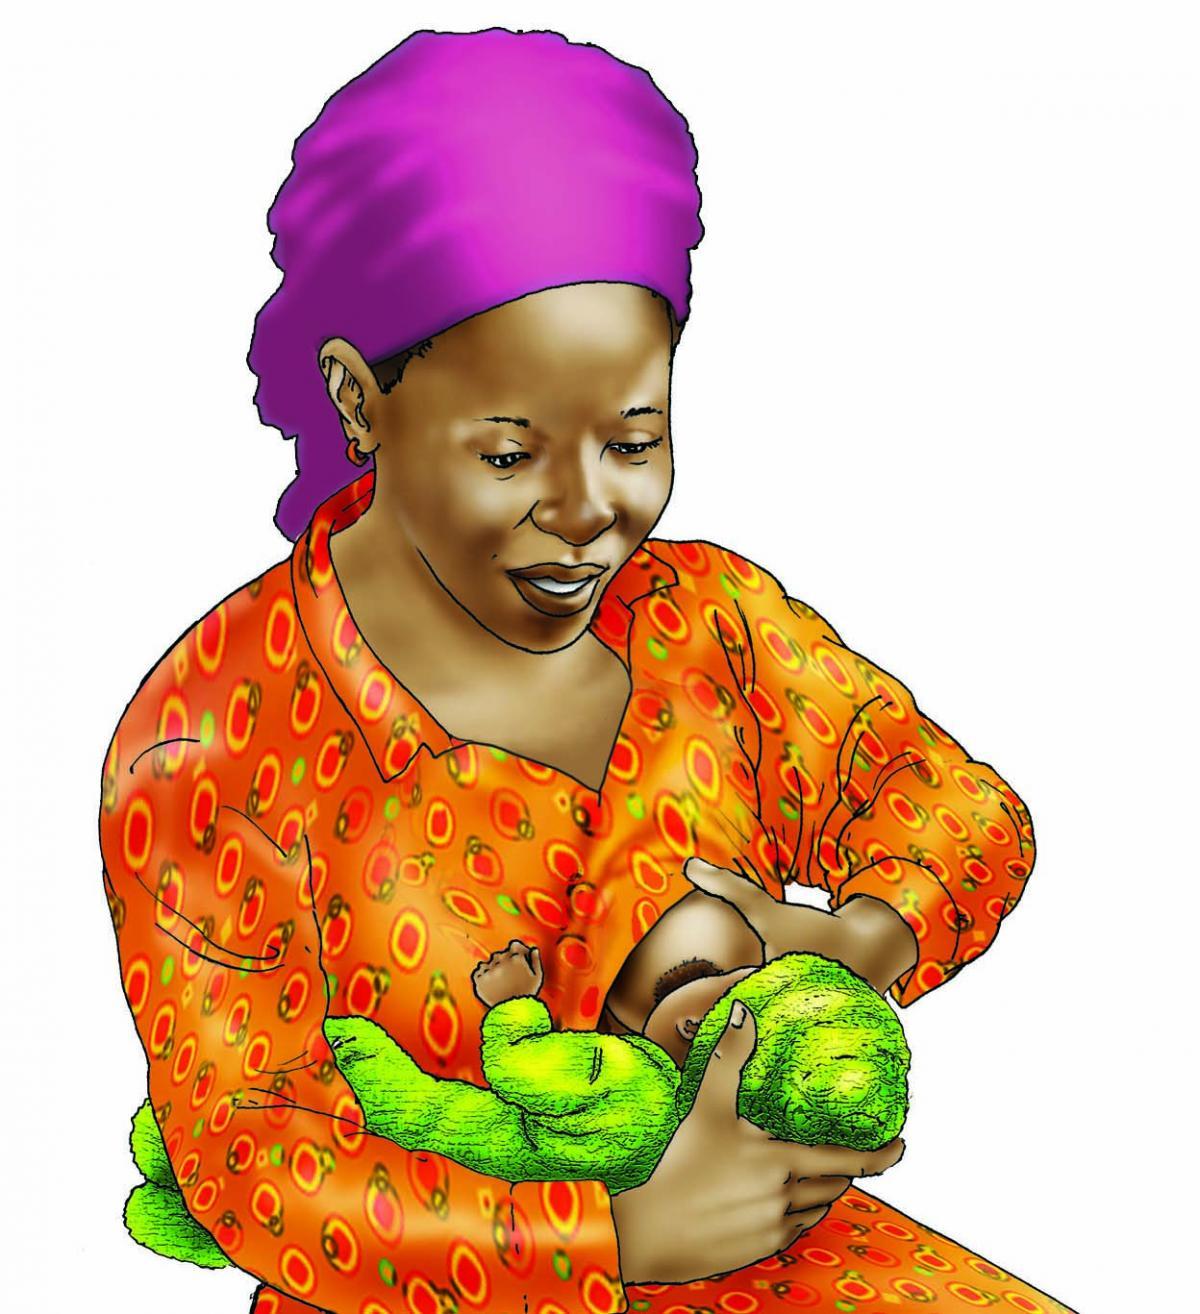 Breastfeeding - Breastfeeding positions - Cross Cradle 0-6 mo - 01 - Nigeria